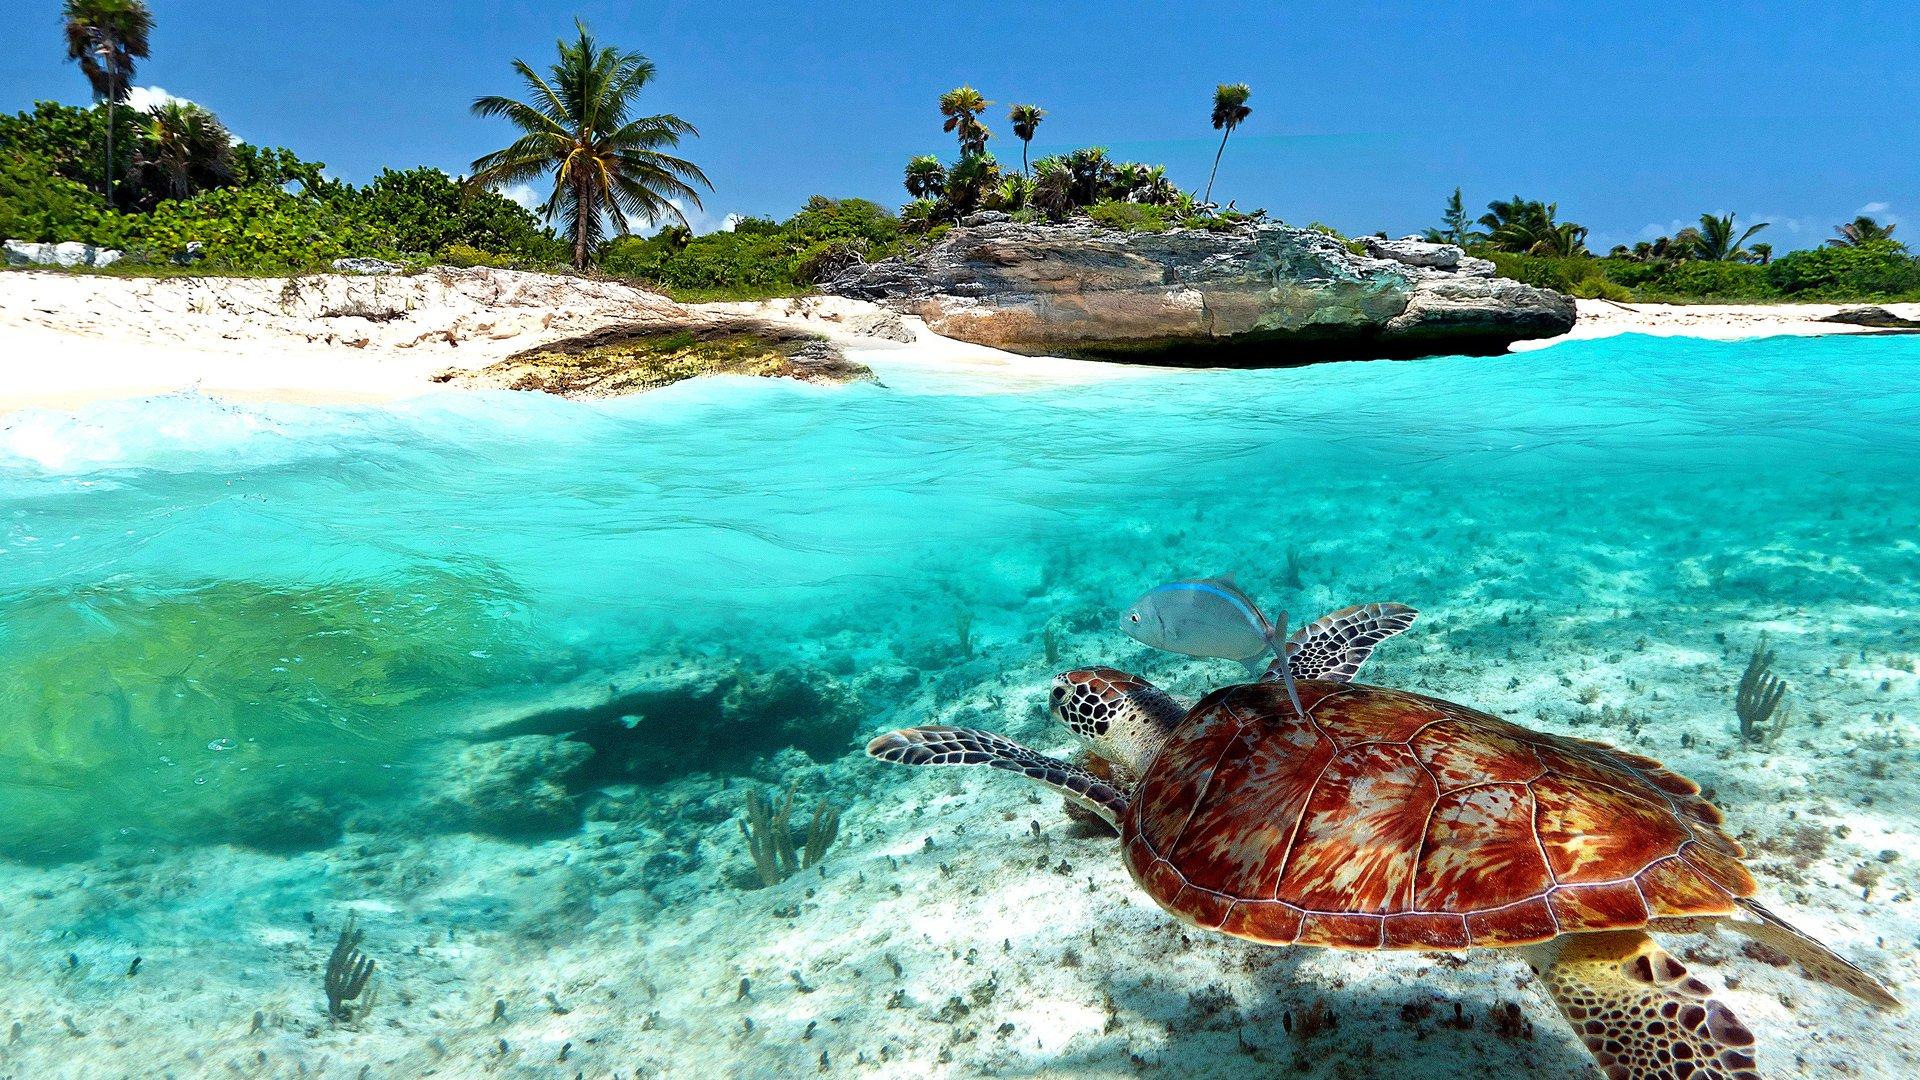 a7036dc0dd7ac Лучшие пляжи Мексики: Akumal, Tulum, Lovers, Cozumel, Playa-del ...